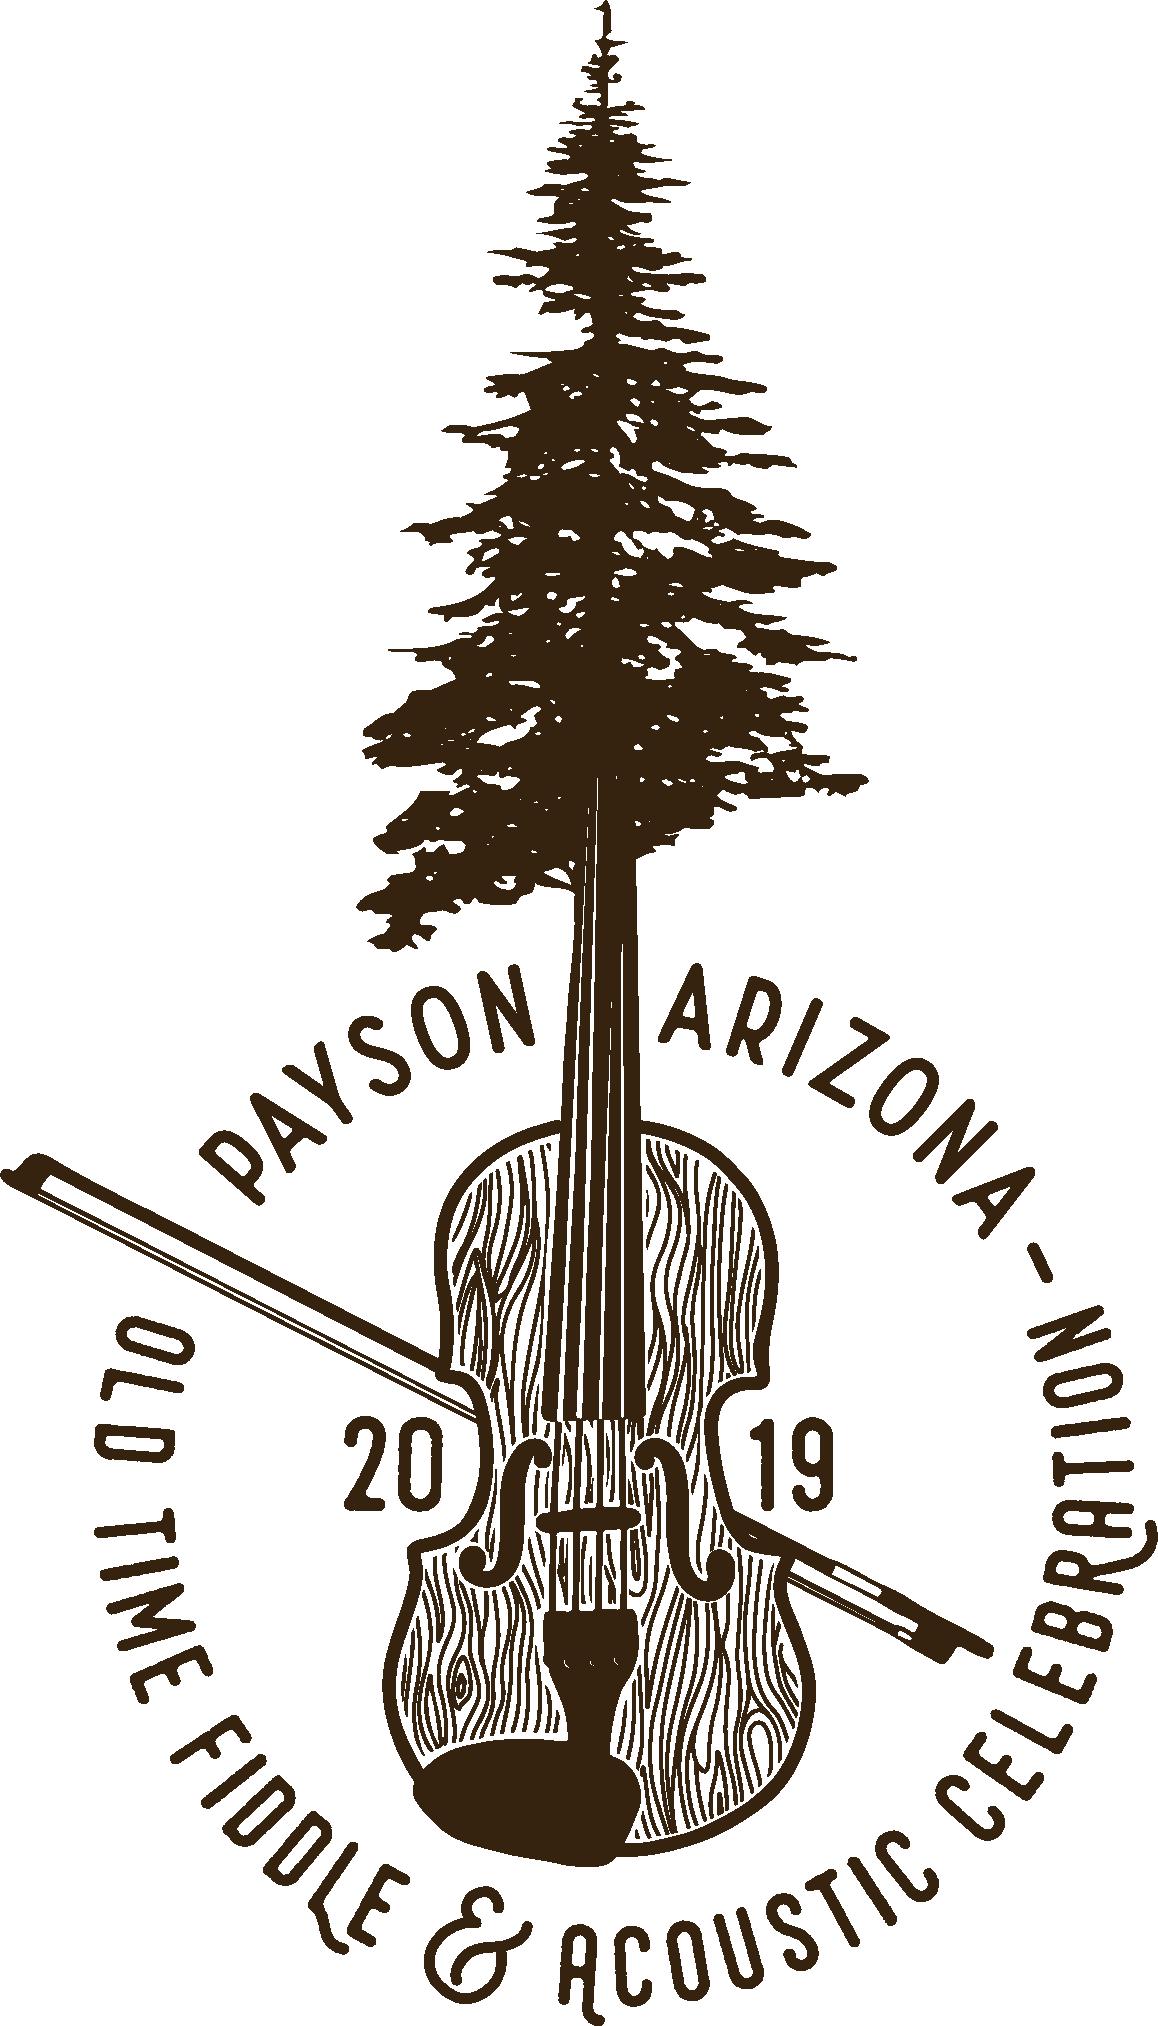 Fiddle & Acoustic Celebration